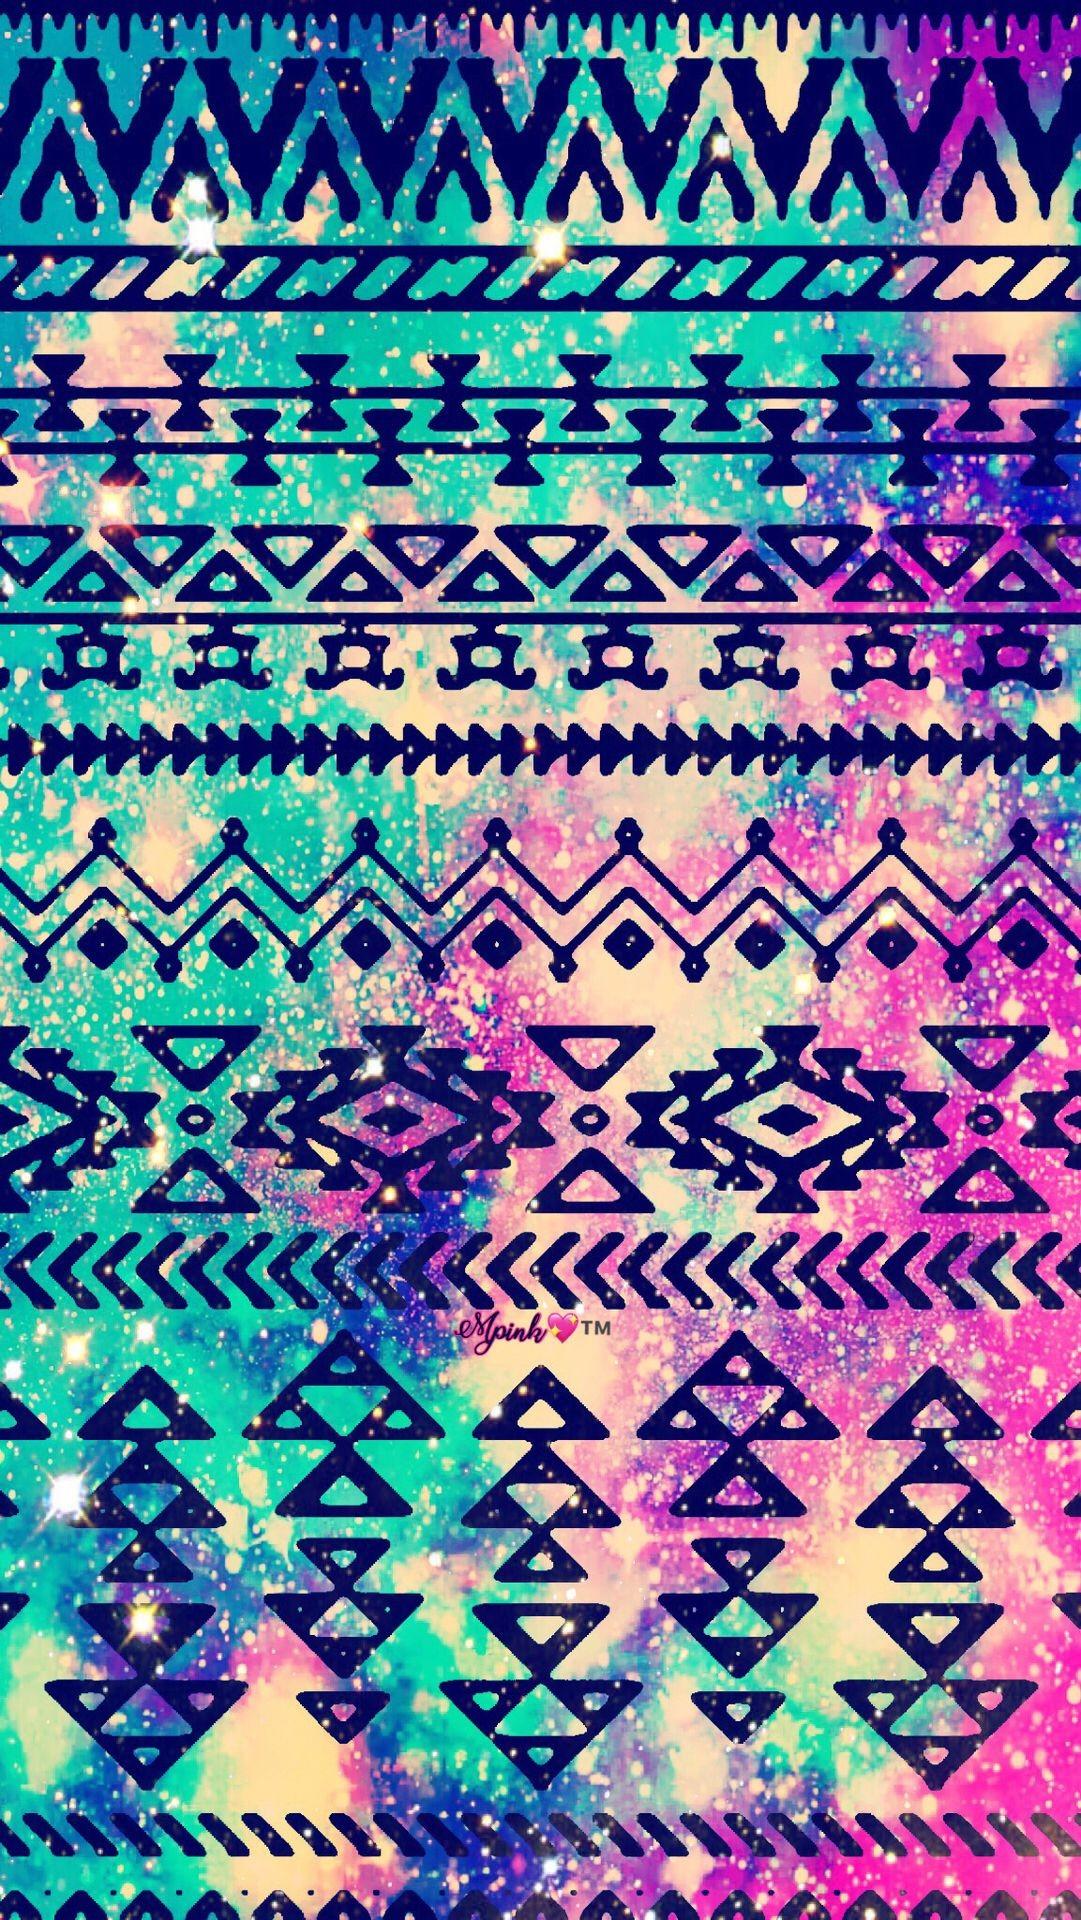 Res: 1081x1920, Grunge Tribal Pattern Galaxy Wallpaper #androidwallpaper #iphonewallpaper # wallpaper #galaxy #sparkle #